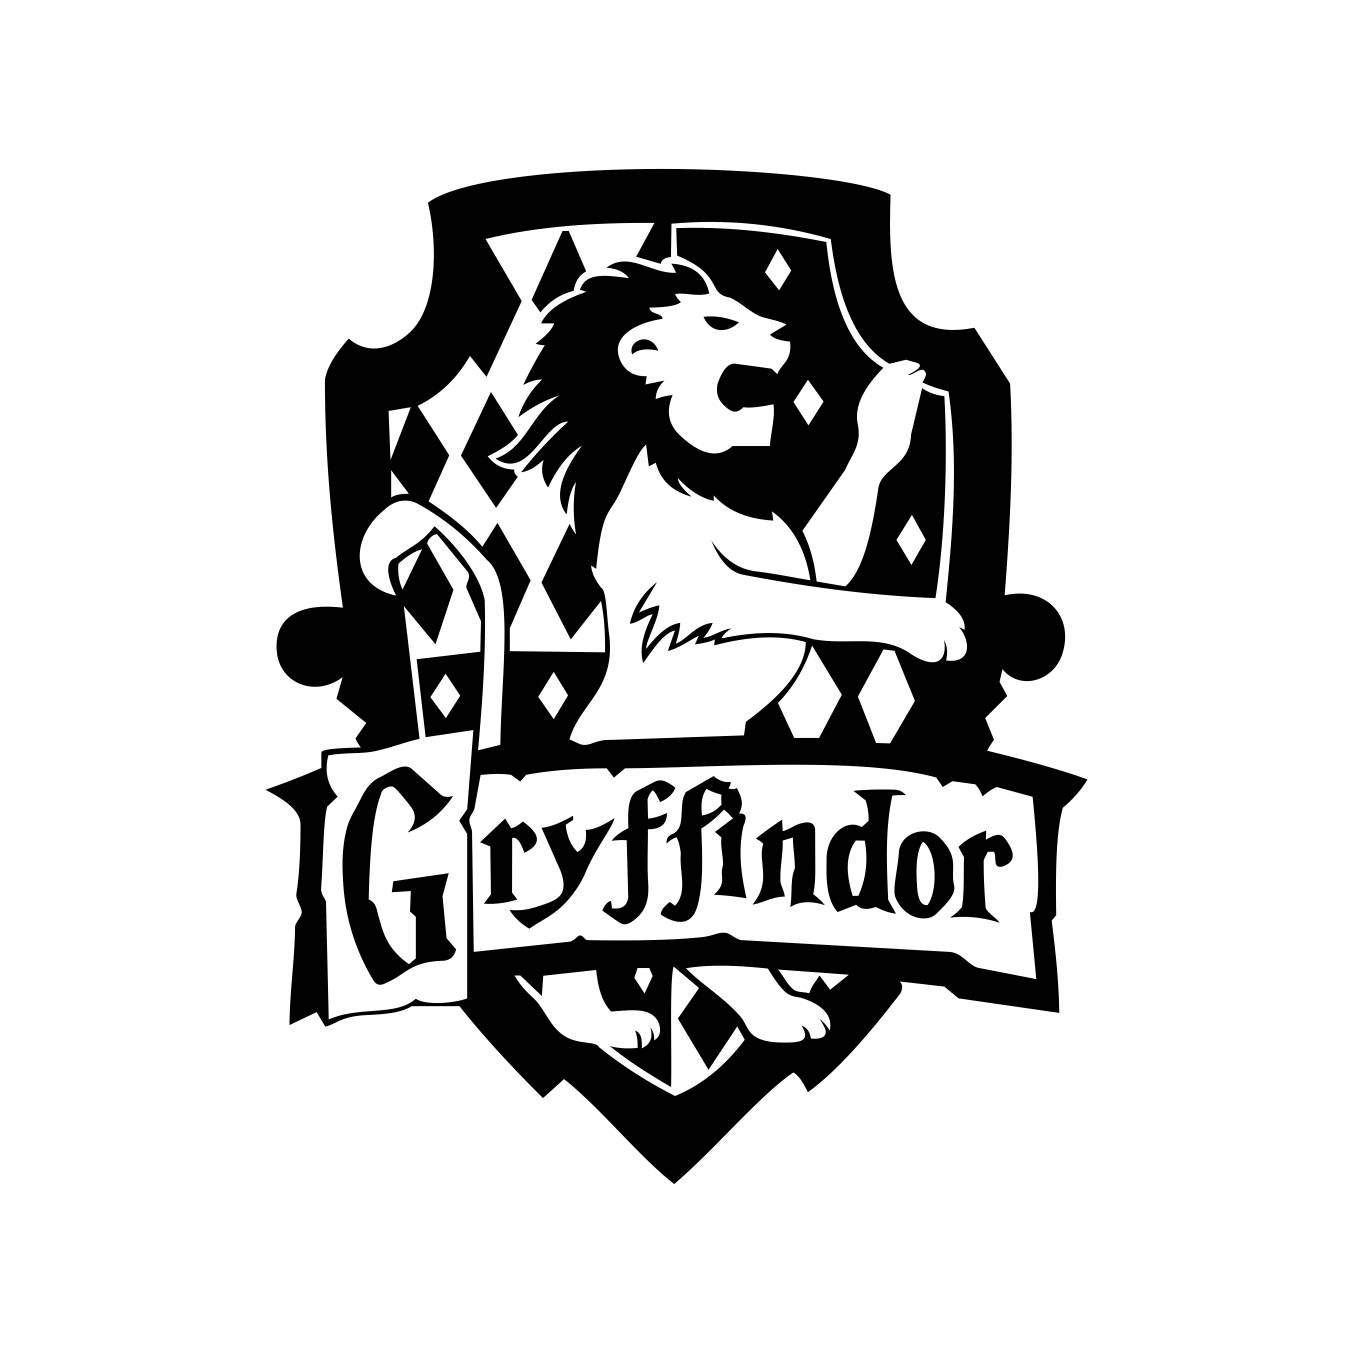 Car body sticker design eps - Gryffindor Harry Potter House Badge Crest Graphics Svg Dxf Eps Png Cdr Ai Pdf Vector Art Window Decalscar